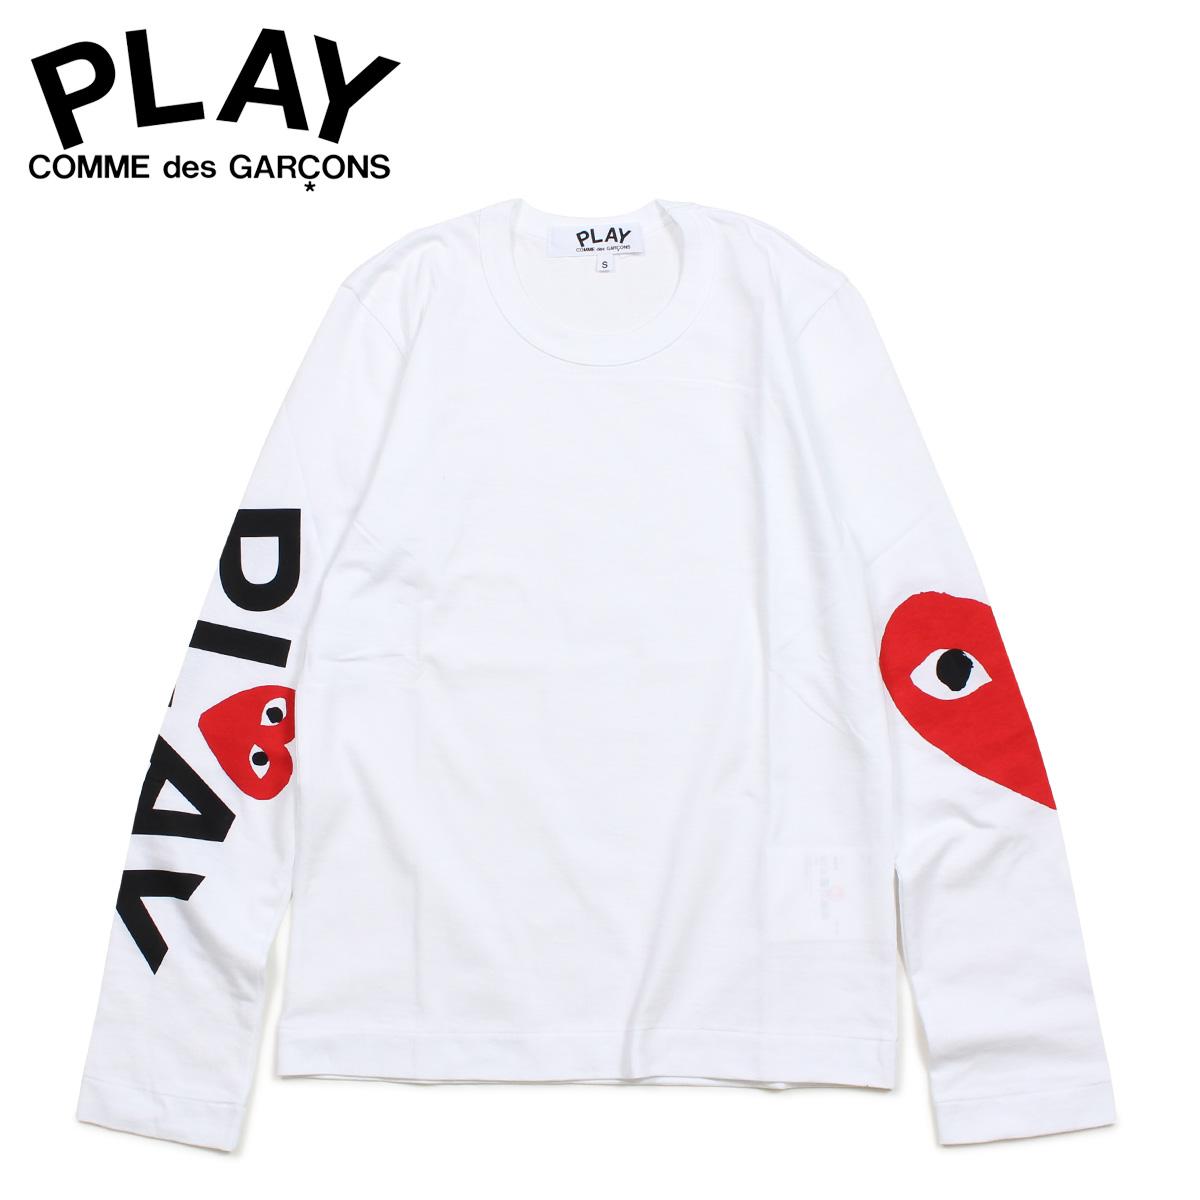 PLAY COMME des GARCONS RED HEART LONG SLEEVE コムデギャルソン Tシャツ レディース 長袖 ロンT ホワイト 白 AZ-T257 [3/29 新入荷]